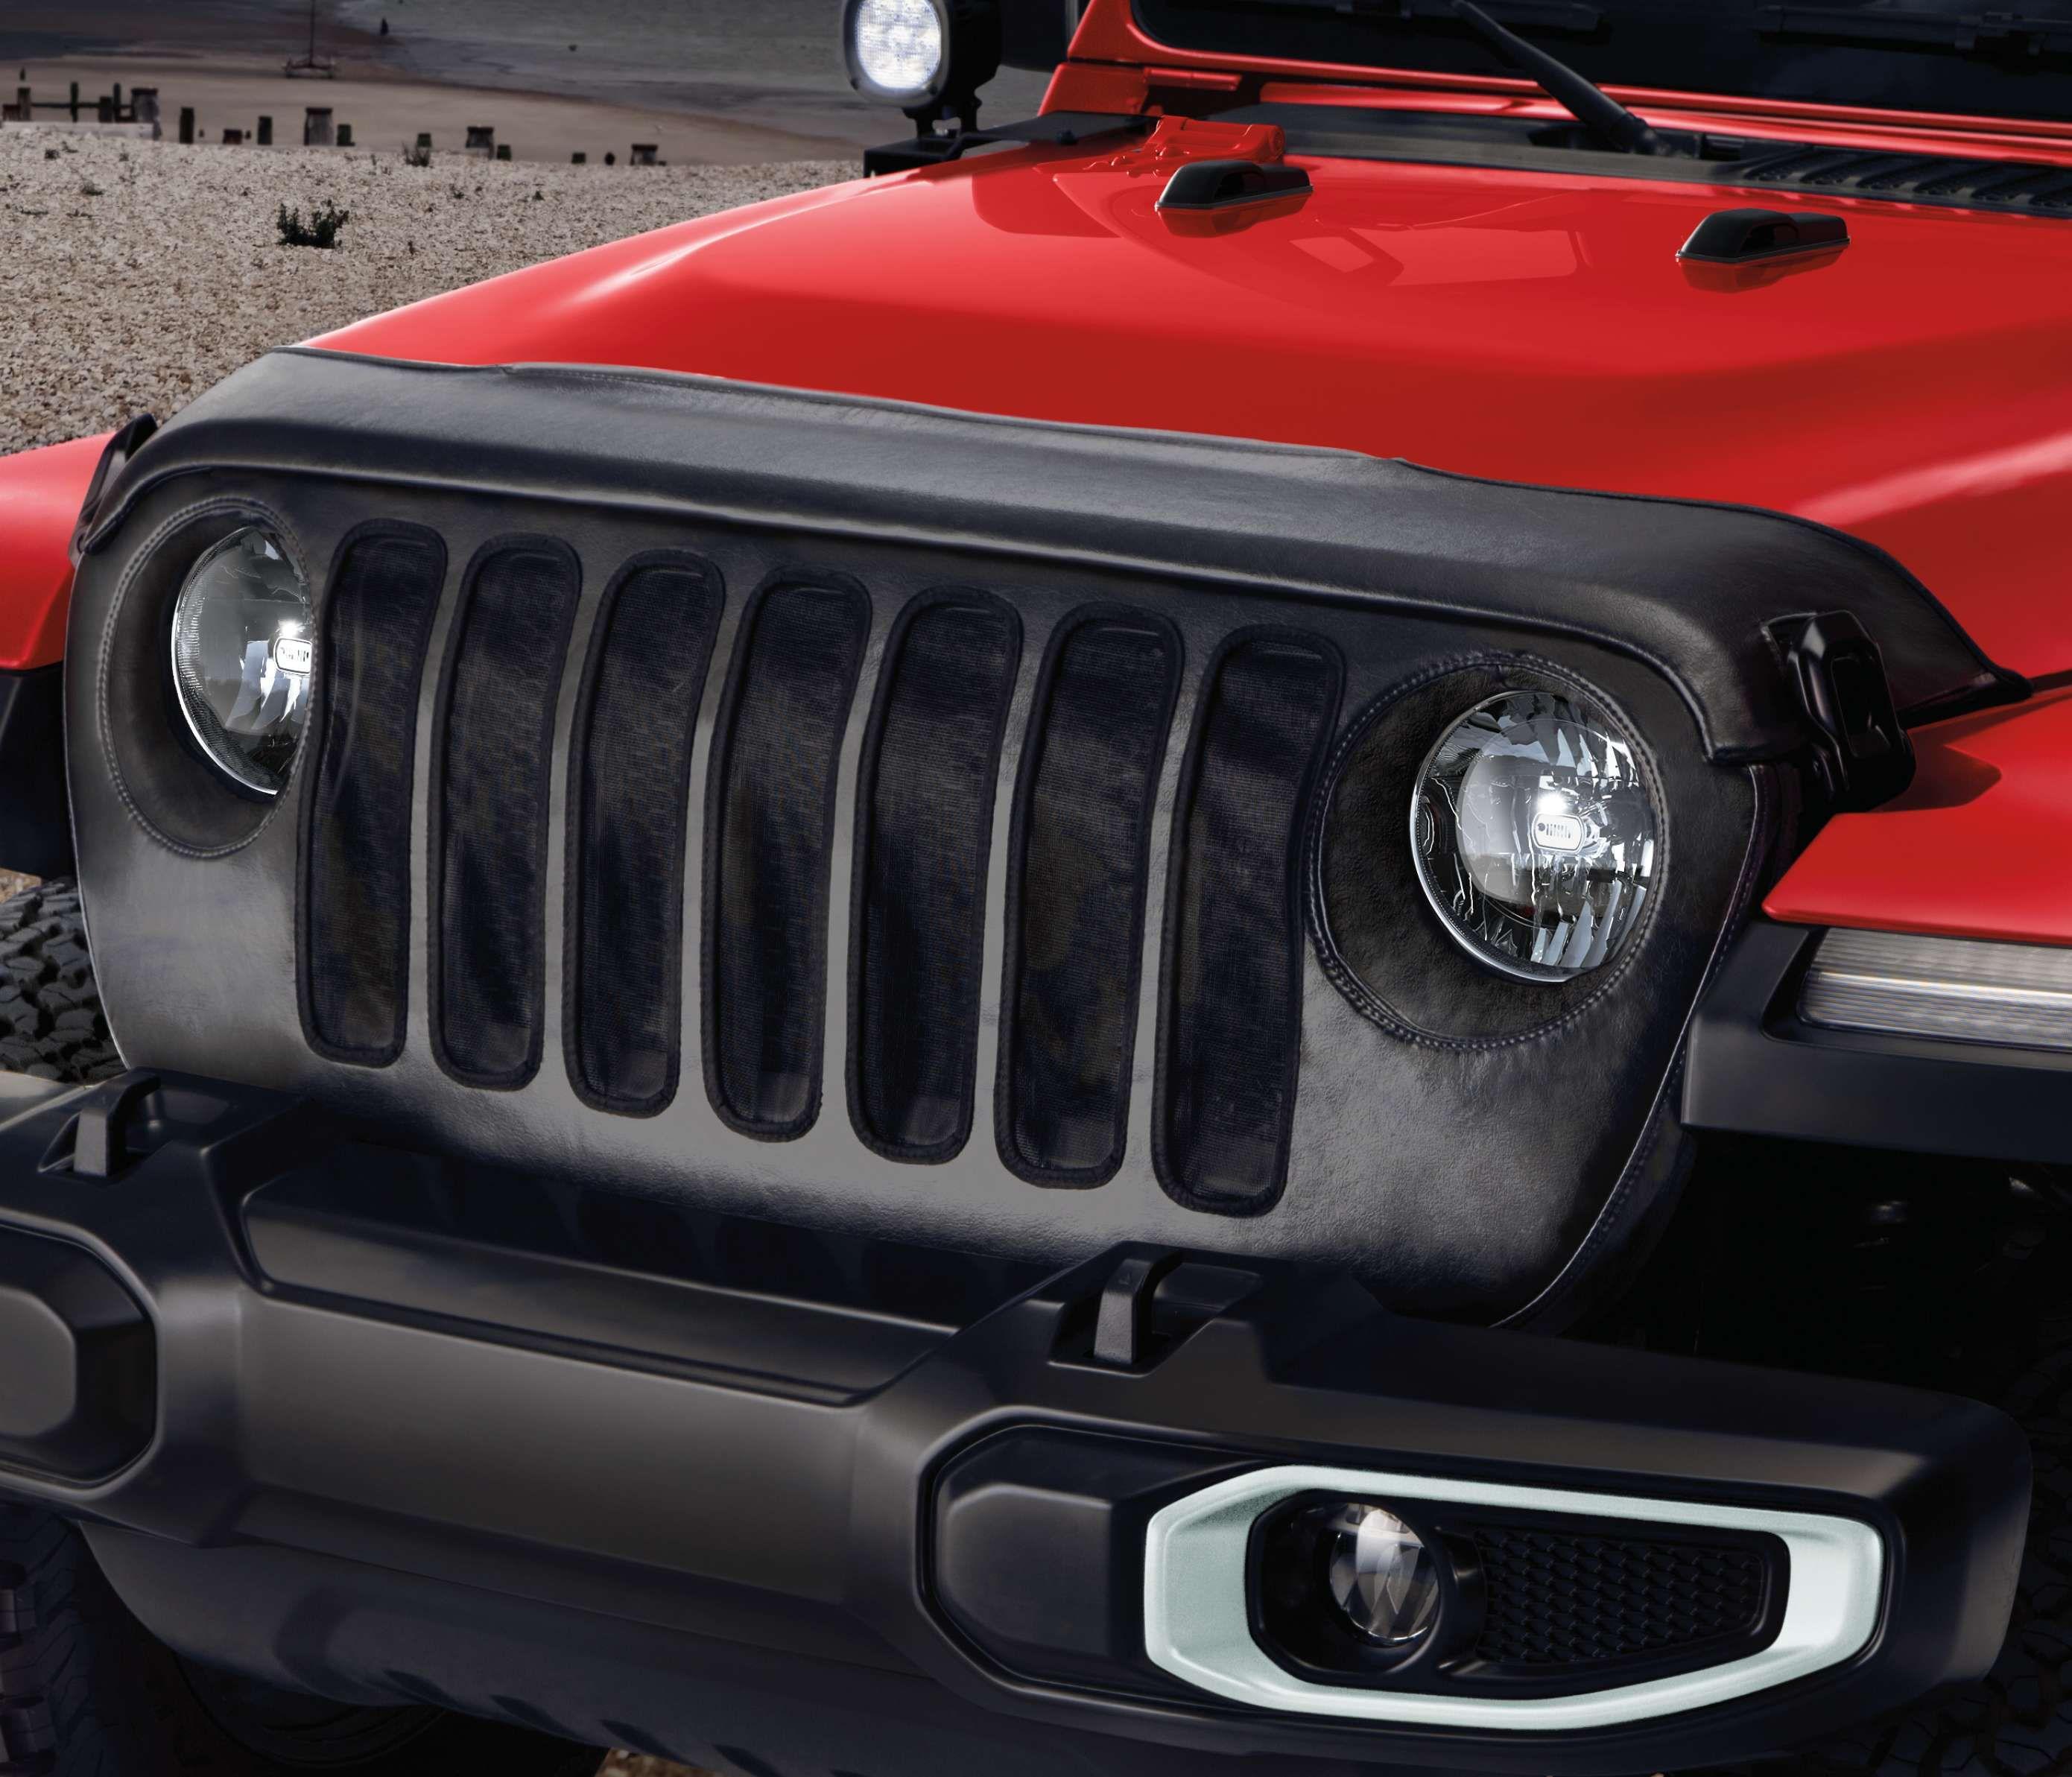 Jeep Wrangler Accessories Fresh 2019 Jeep Wrangler Jl Exterior Accessories Covers Parts Jeep Wrangler Accessories Jeep Wrangler Wrangler Accessories